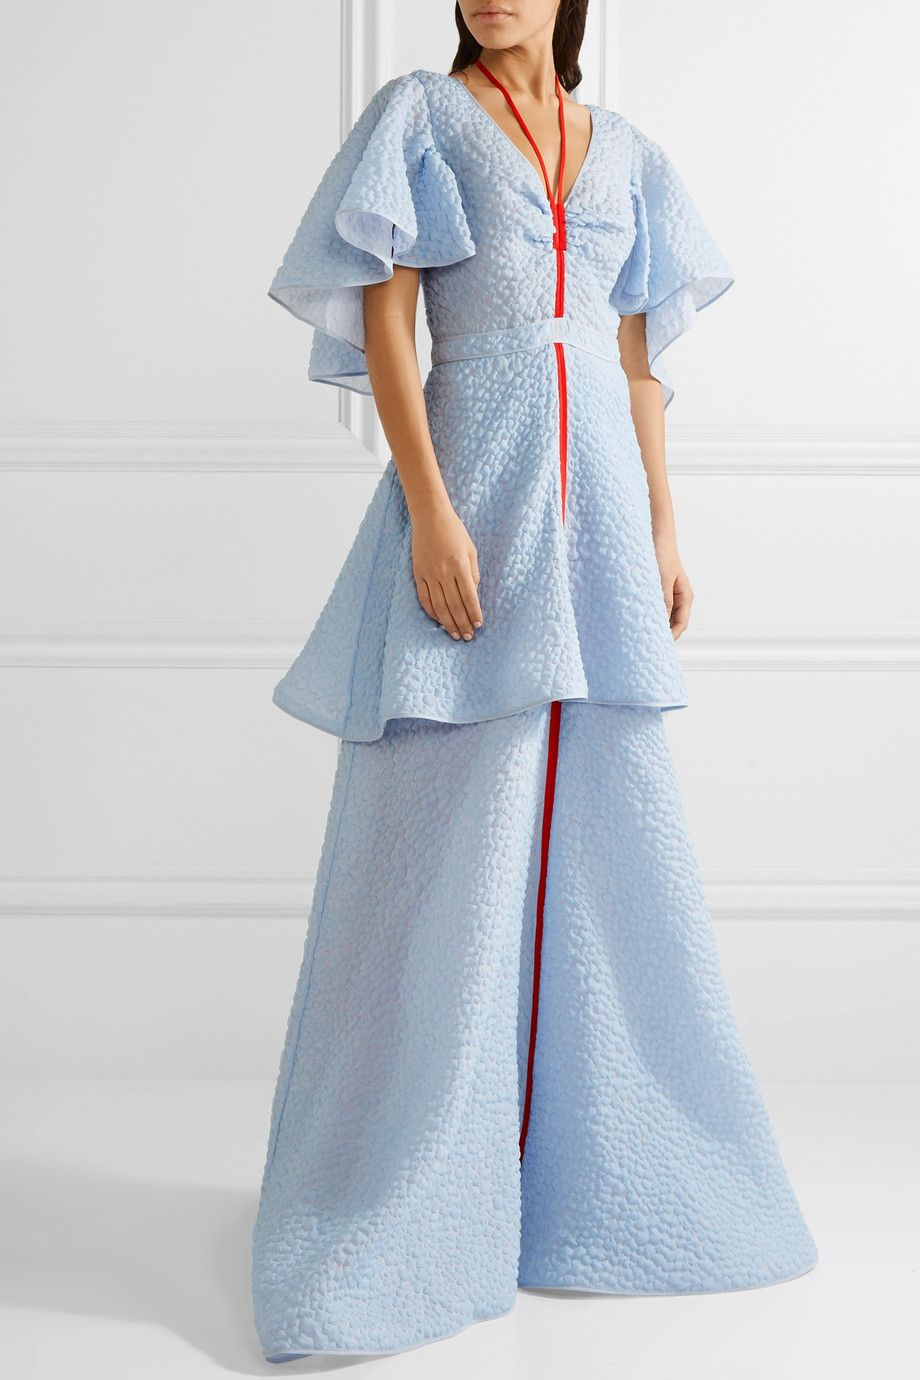 Rosie Assoulin   Tie-neck ruffled seersucker gown   NET-A-PORTER.COM ...